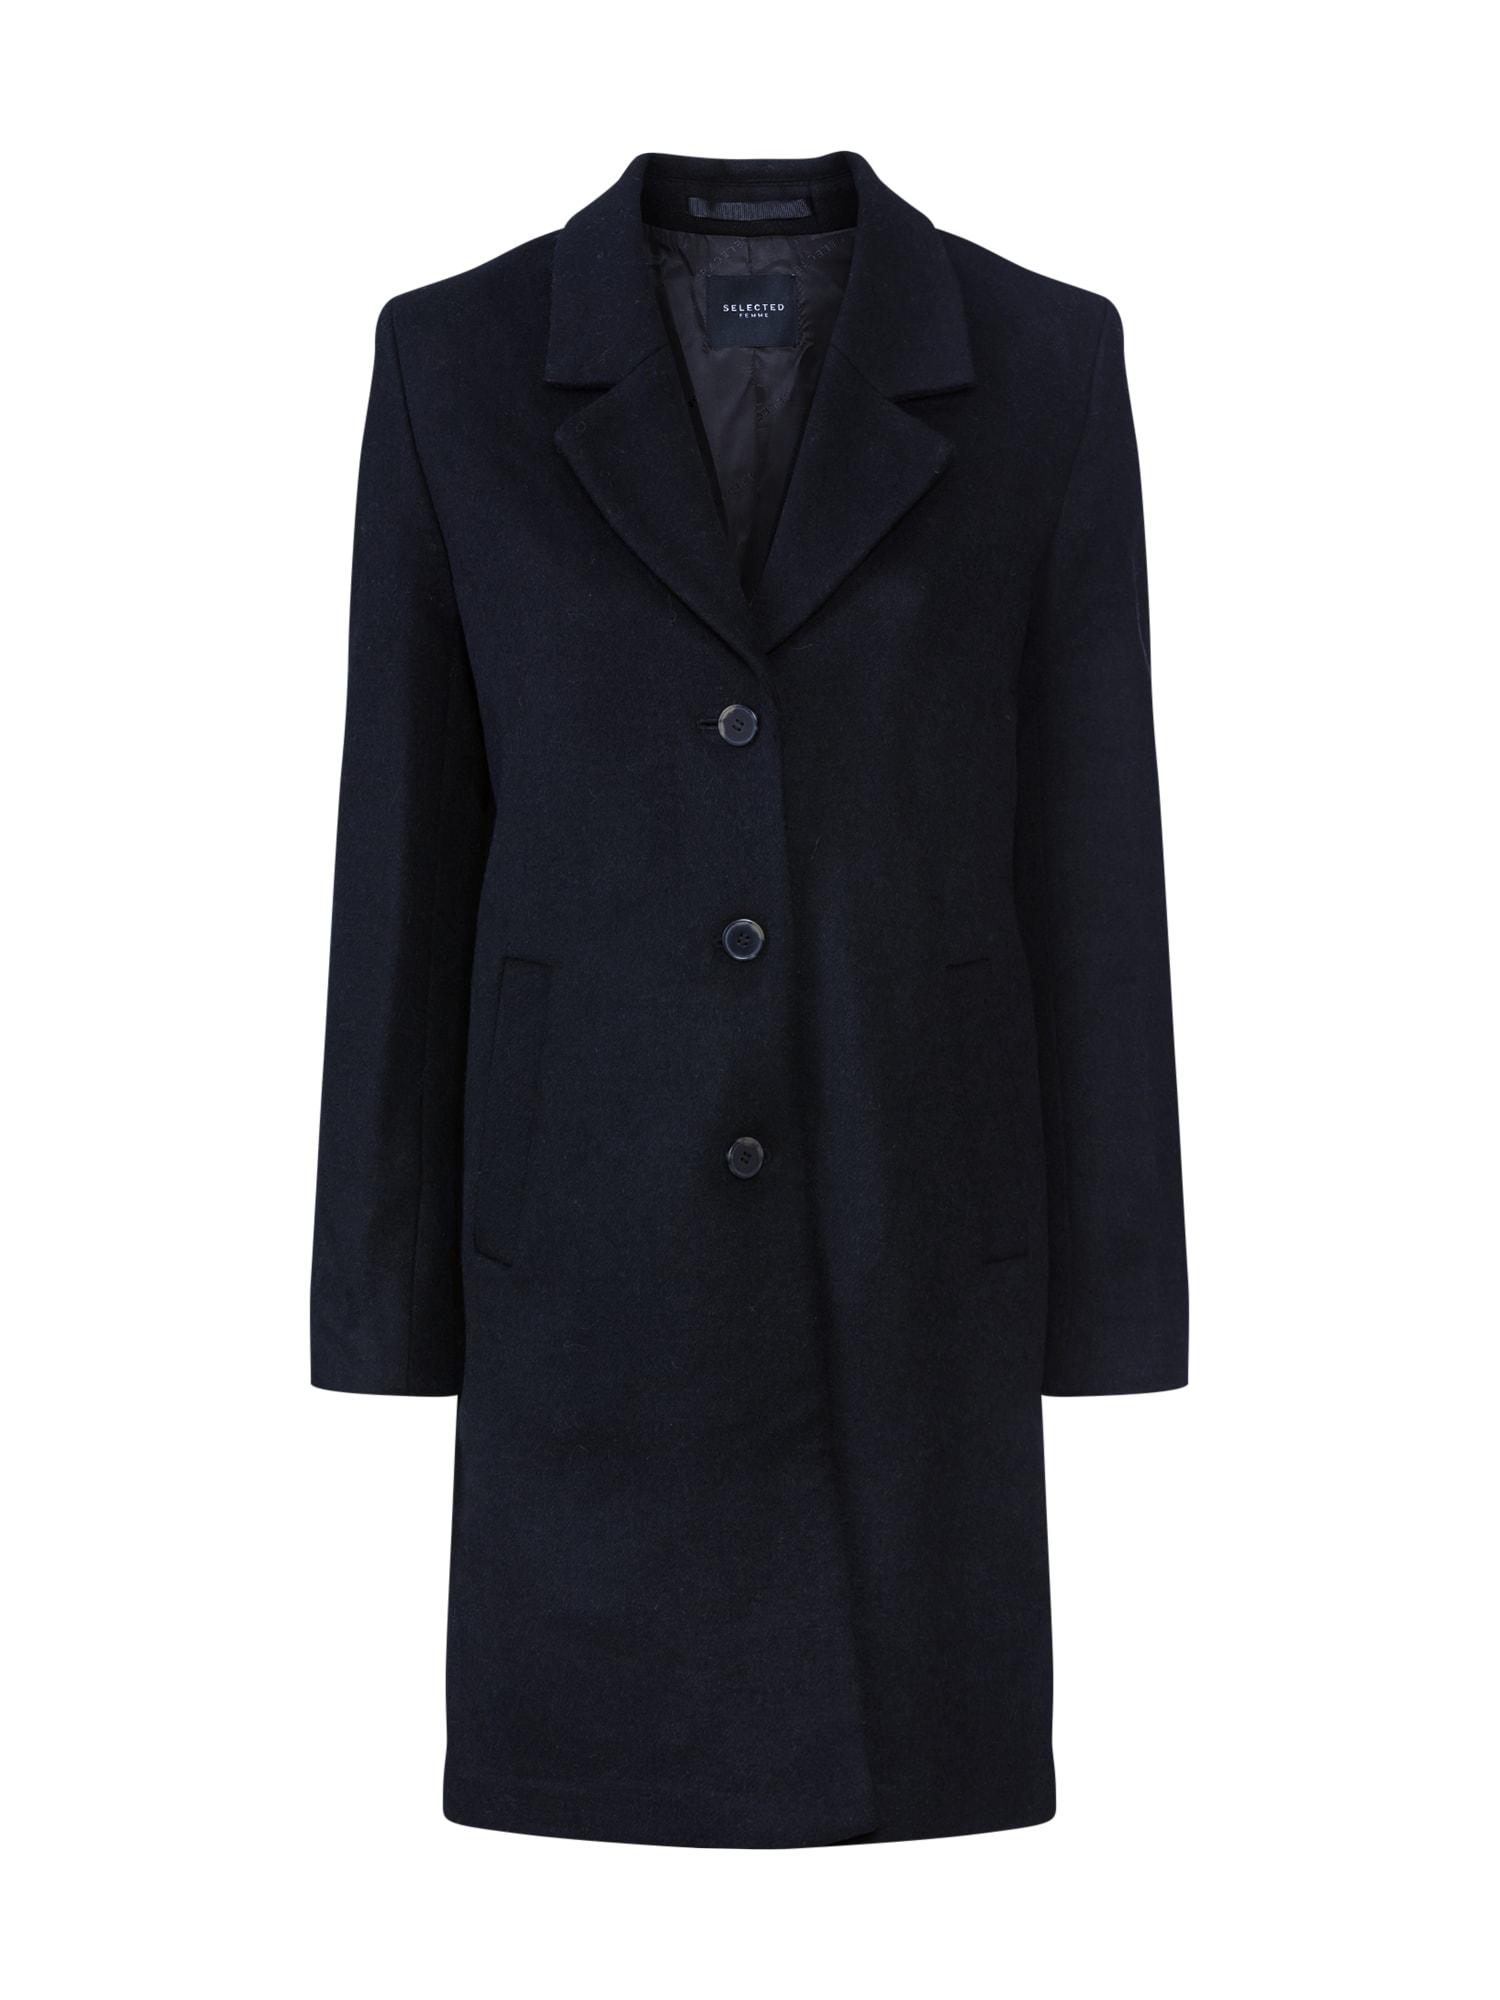 SELECTED FEMME Demisezoninis paltas juoda